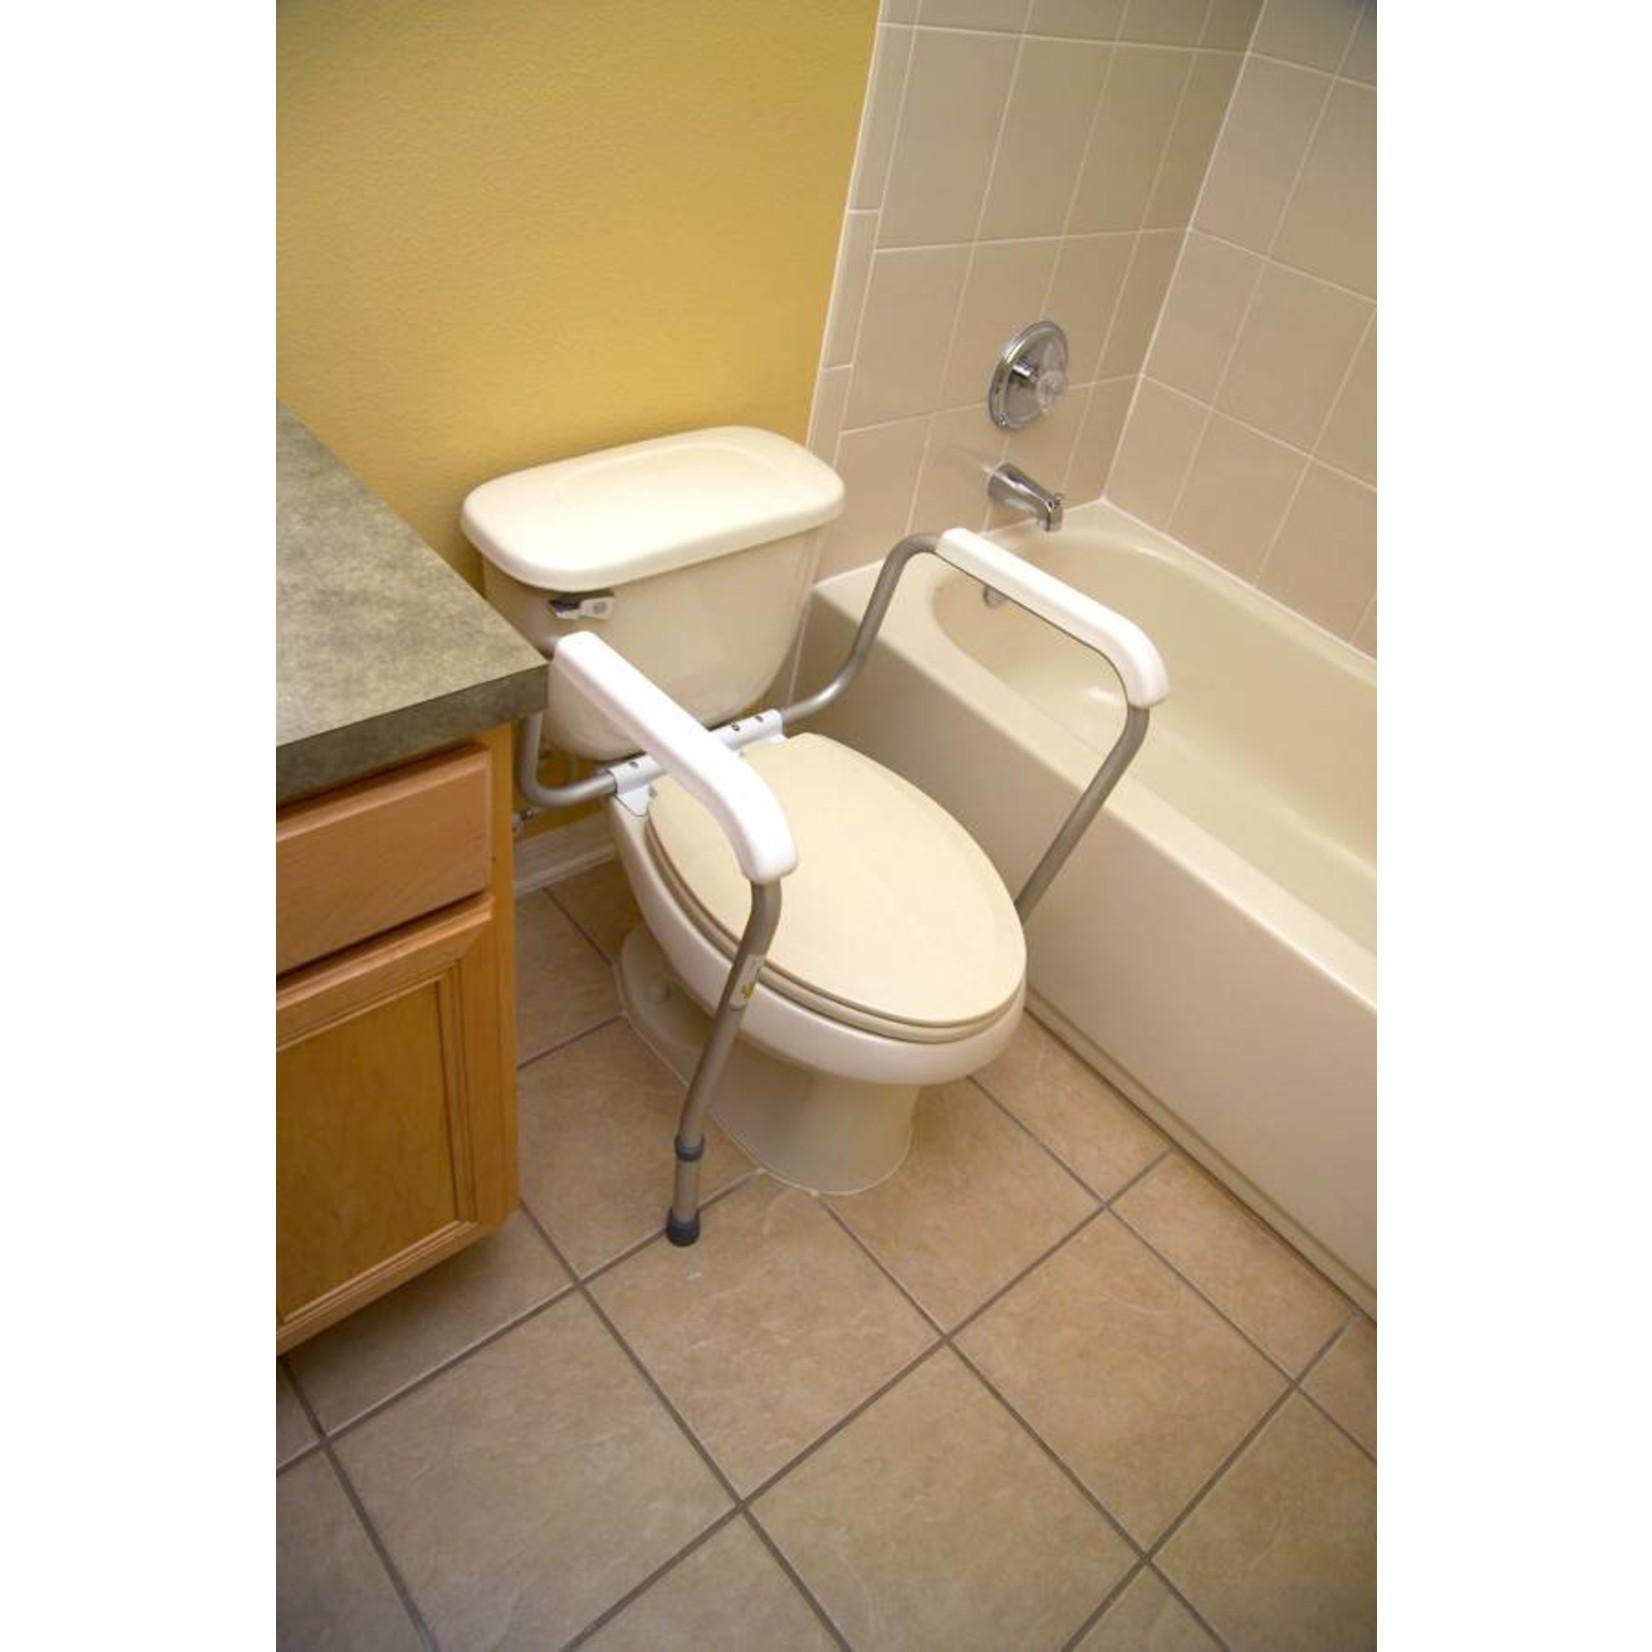 Essential Medical Toilet Safety frame